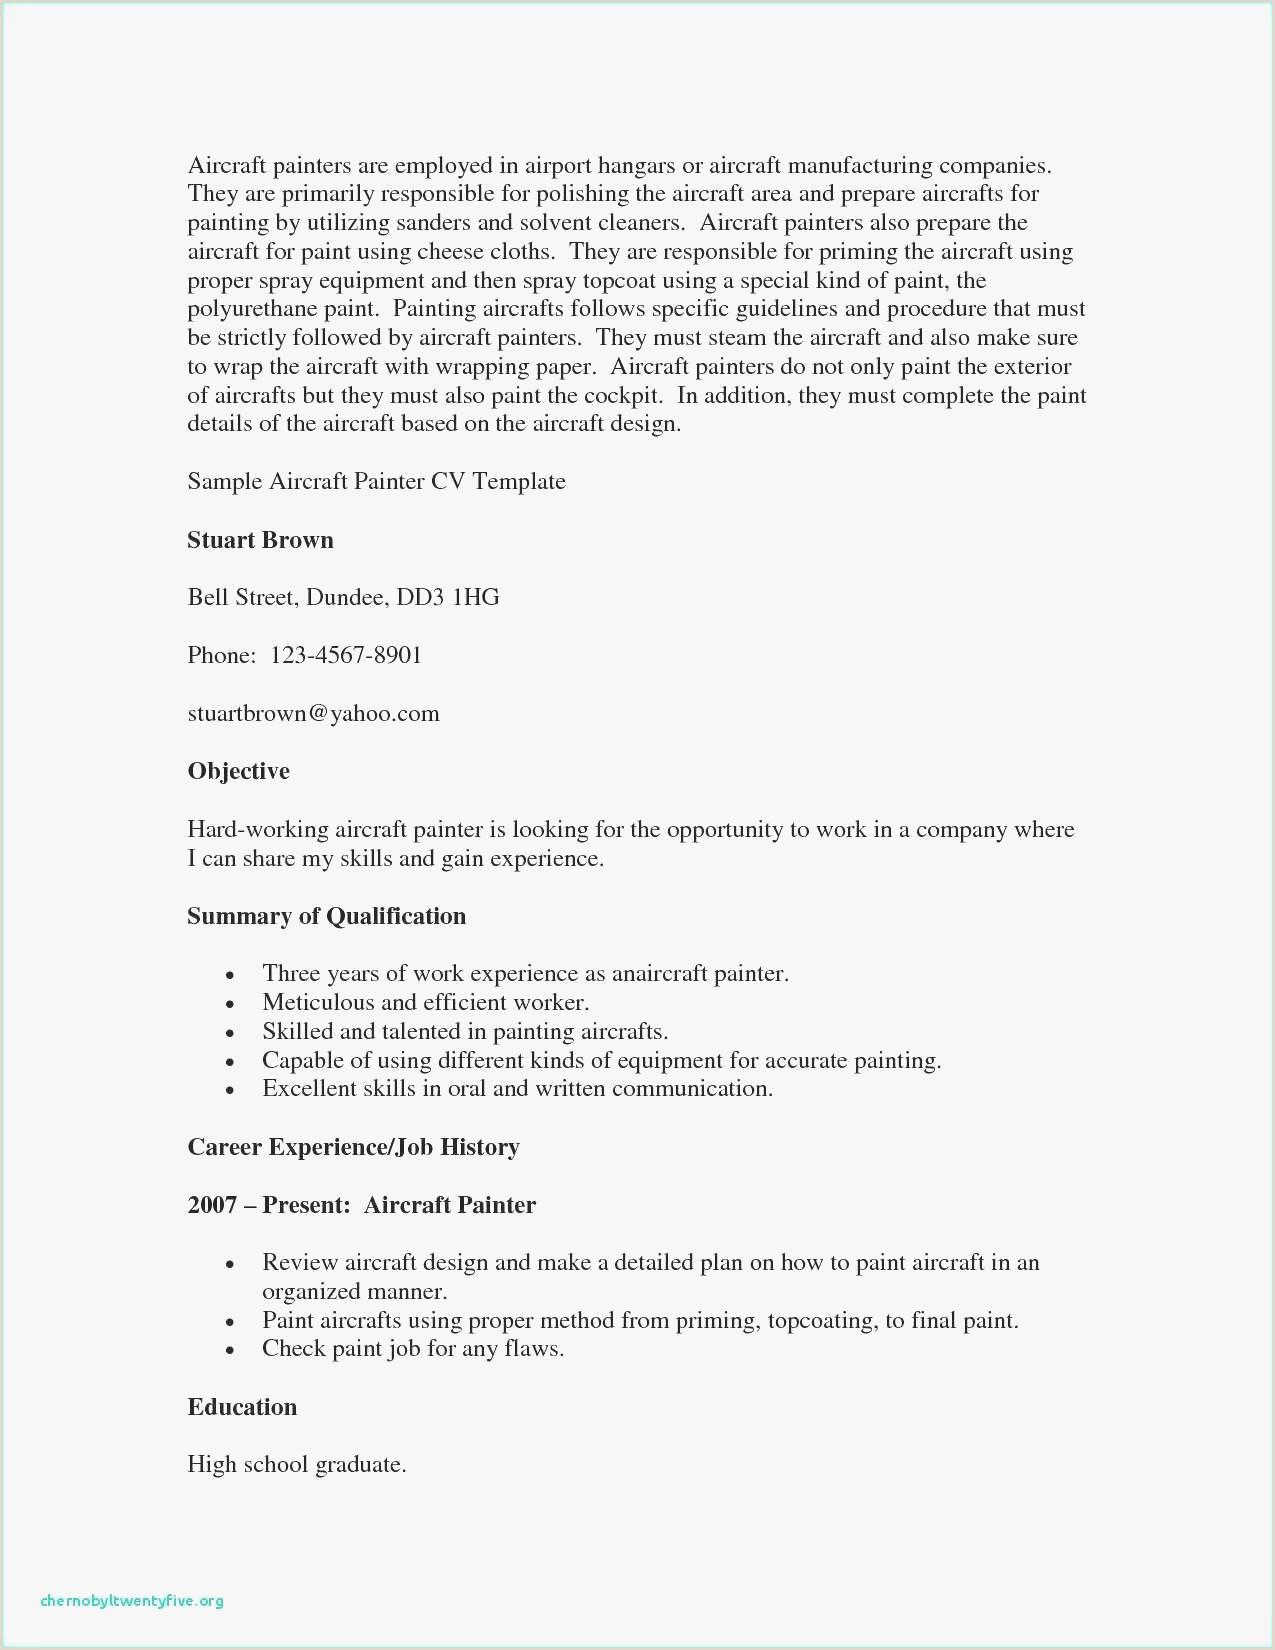 Resume format for Job Experience Job Resume Sample Examples Job Description Examples – Job